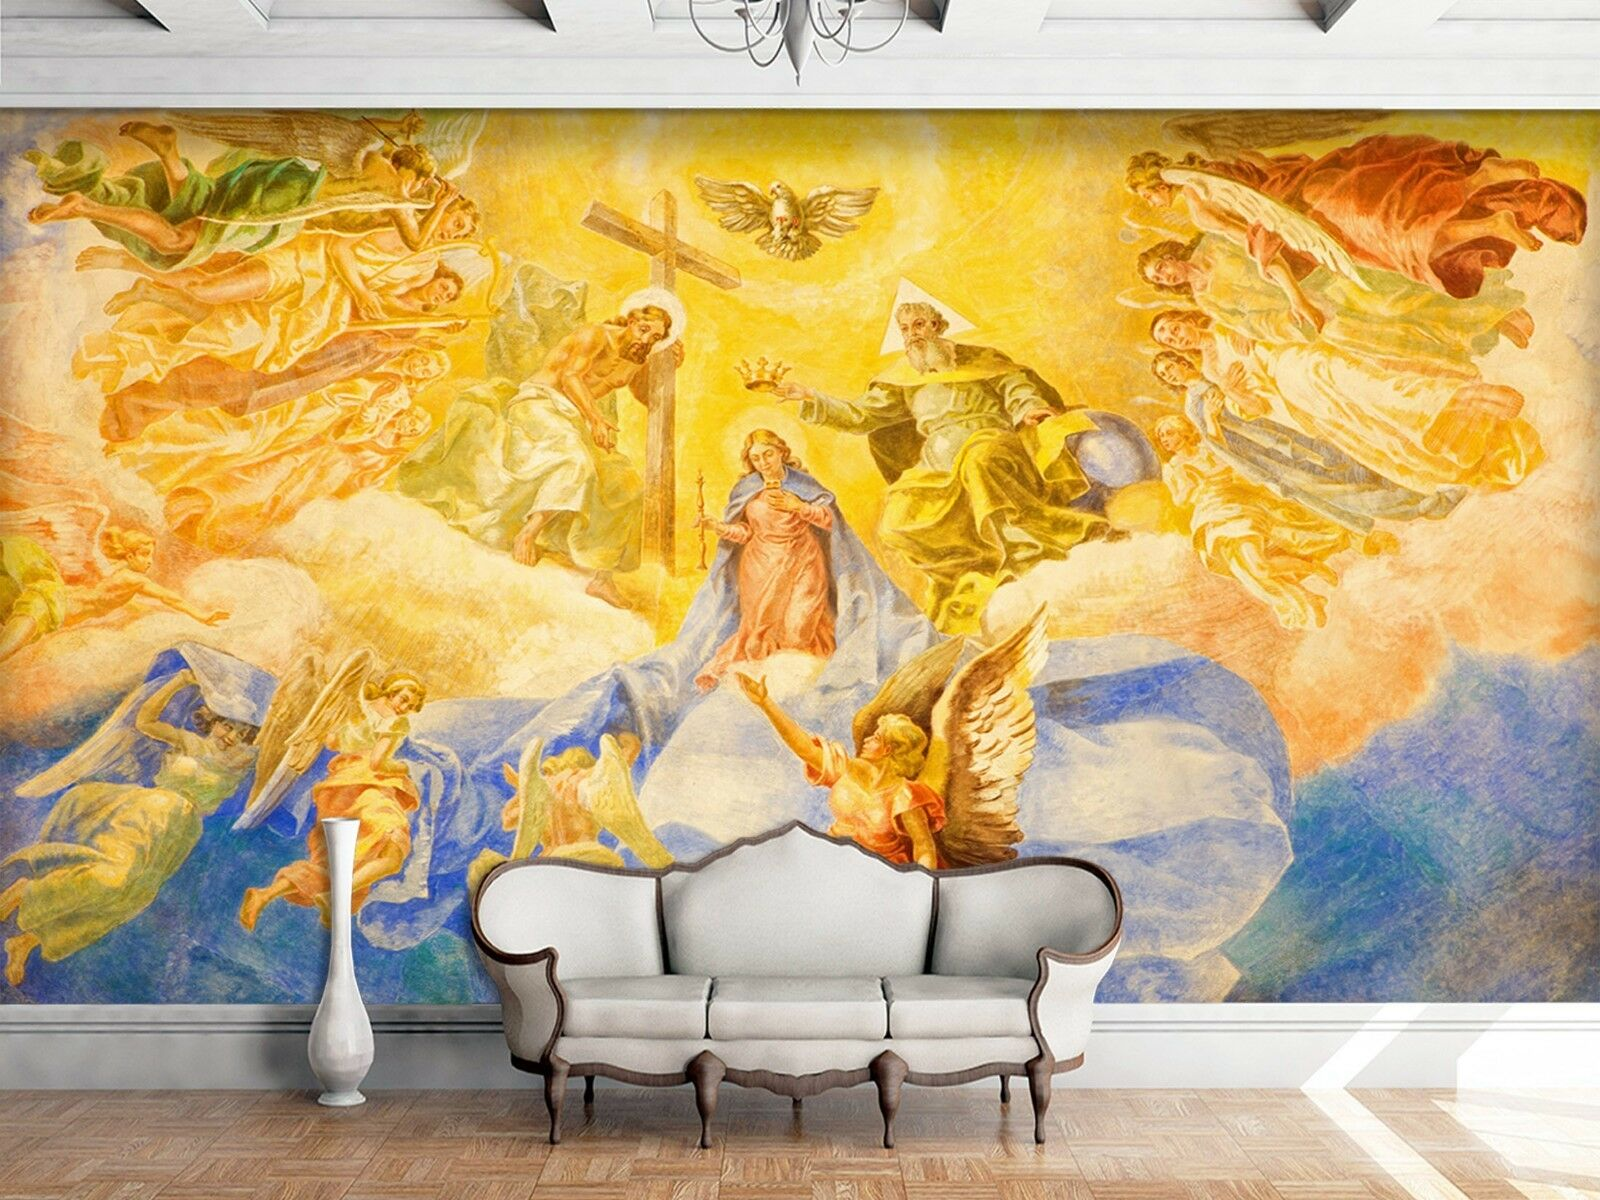 3D Gold Brilliant Heaven 2 Wallpaper Mural Print Wall Indoor Wallpaper Murals UK